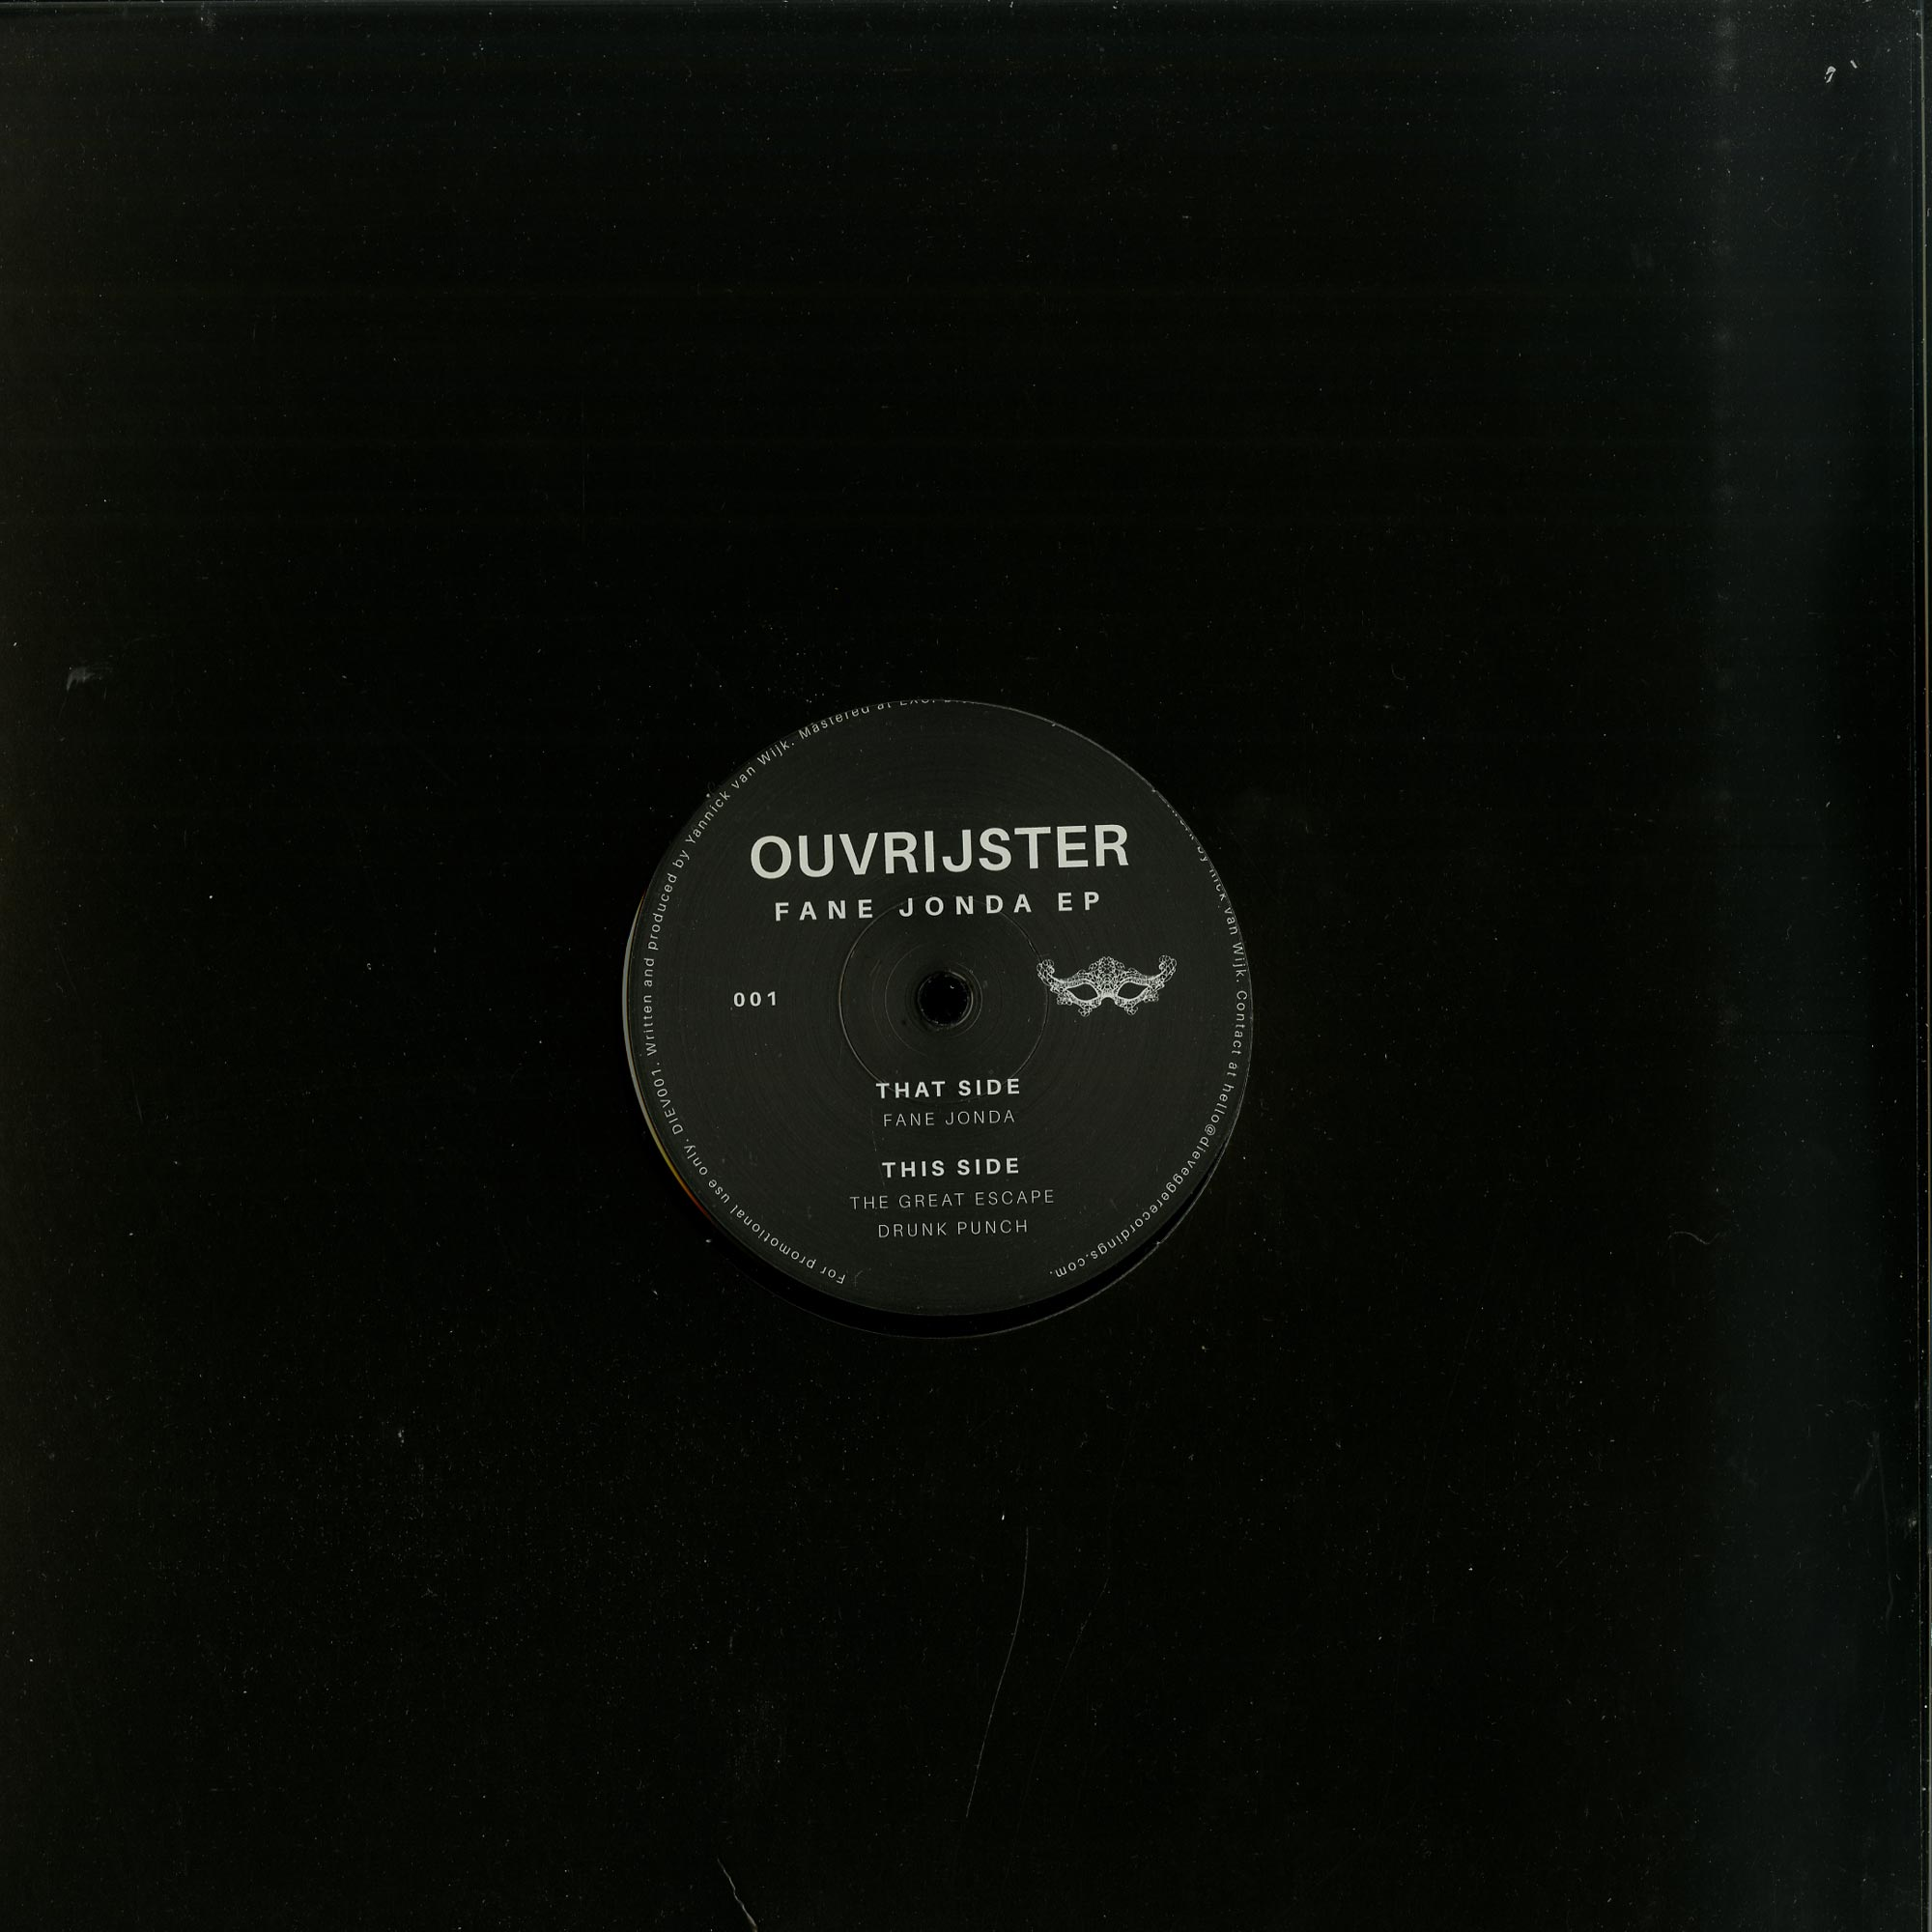 Ouvrijster - Fane Jonda EP